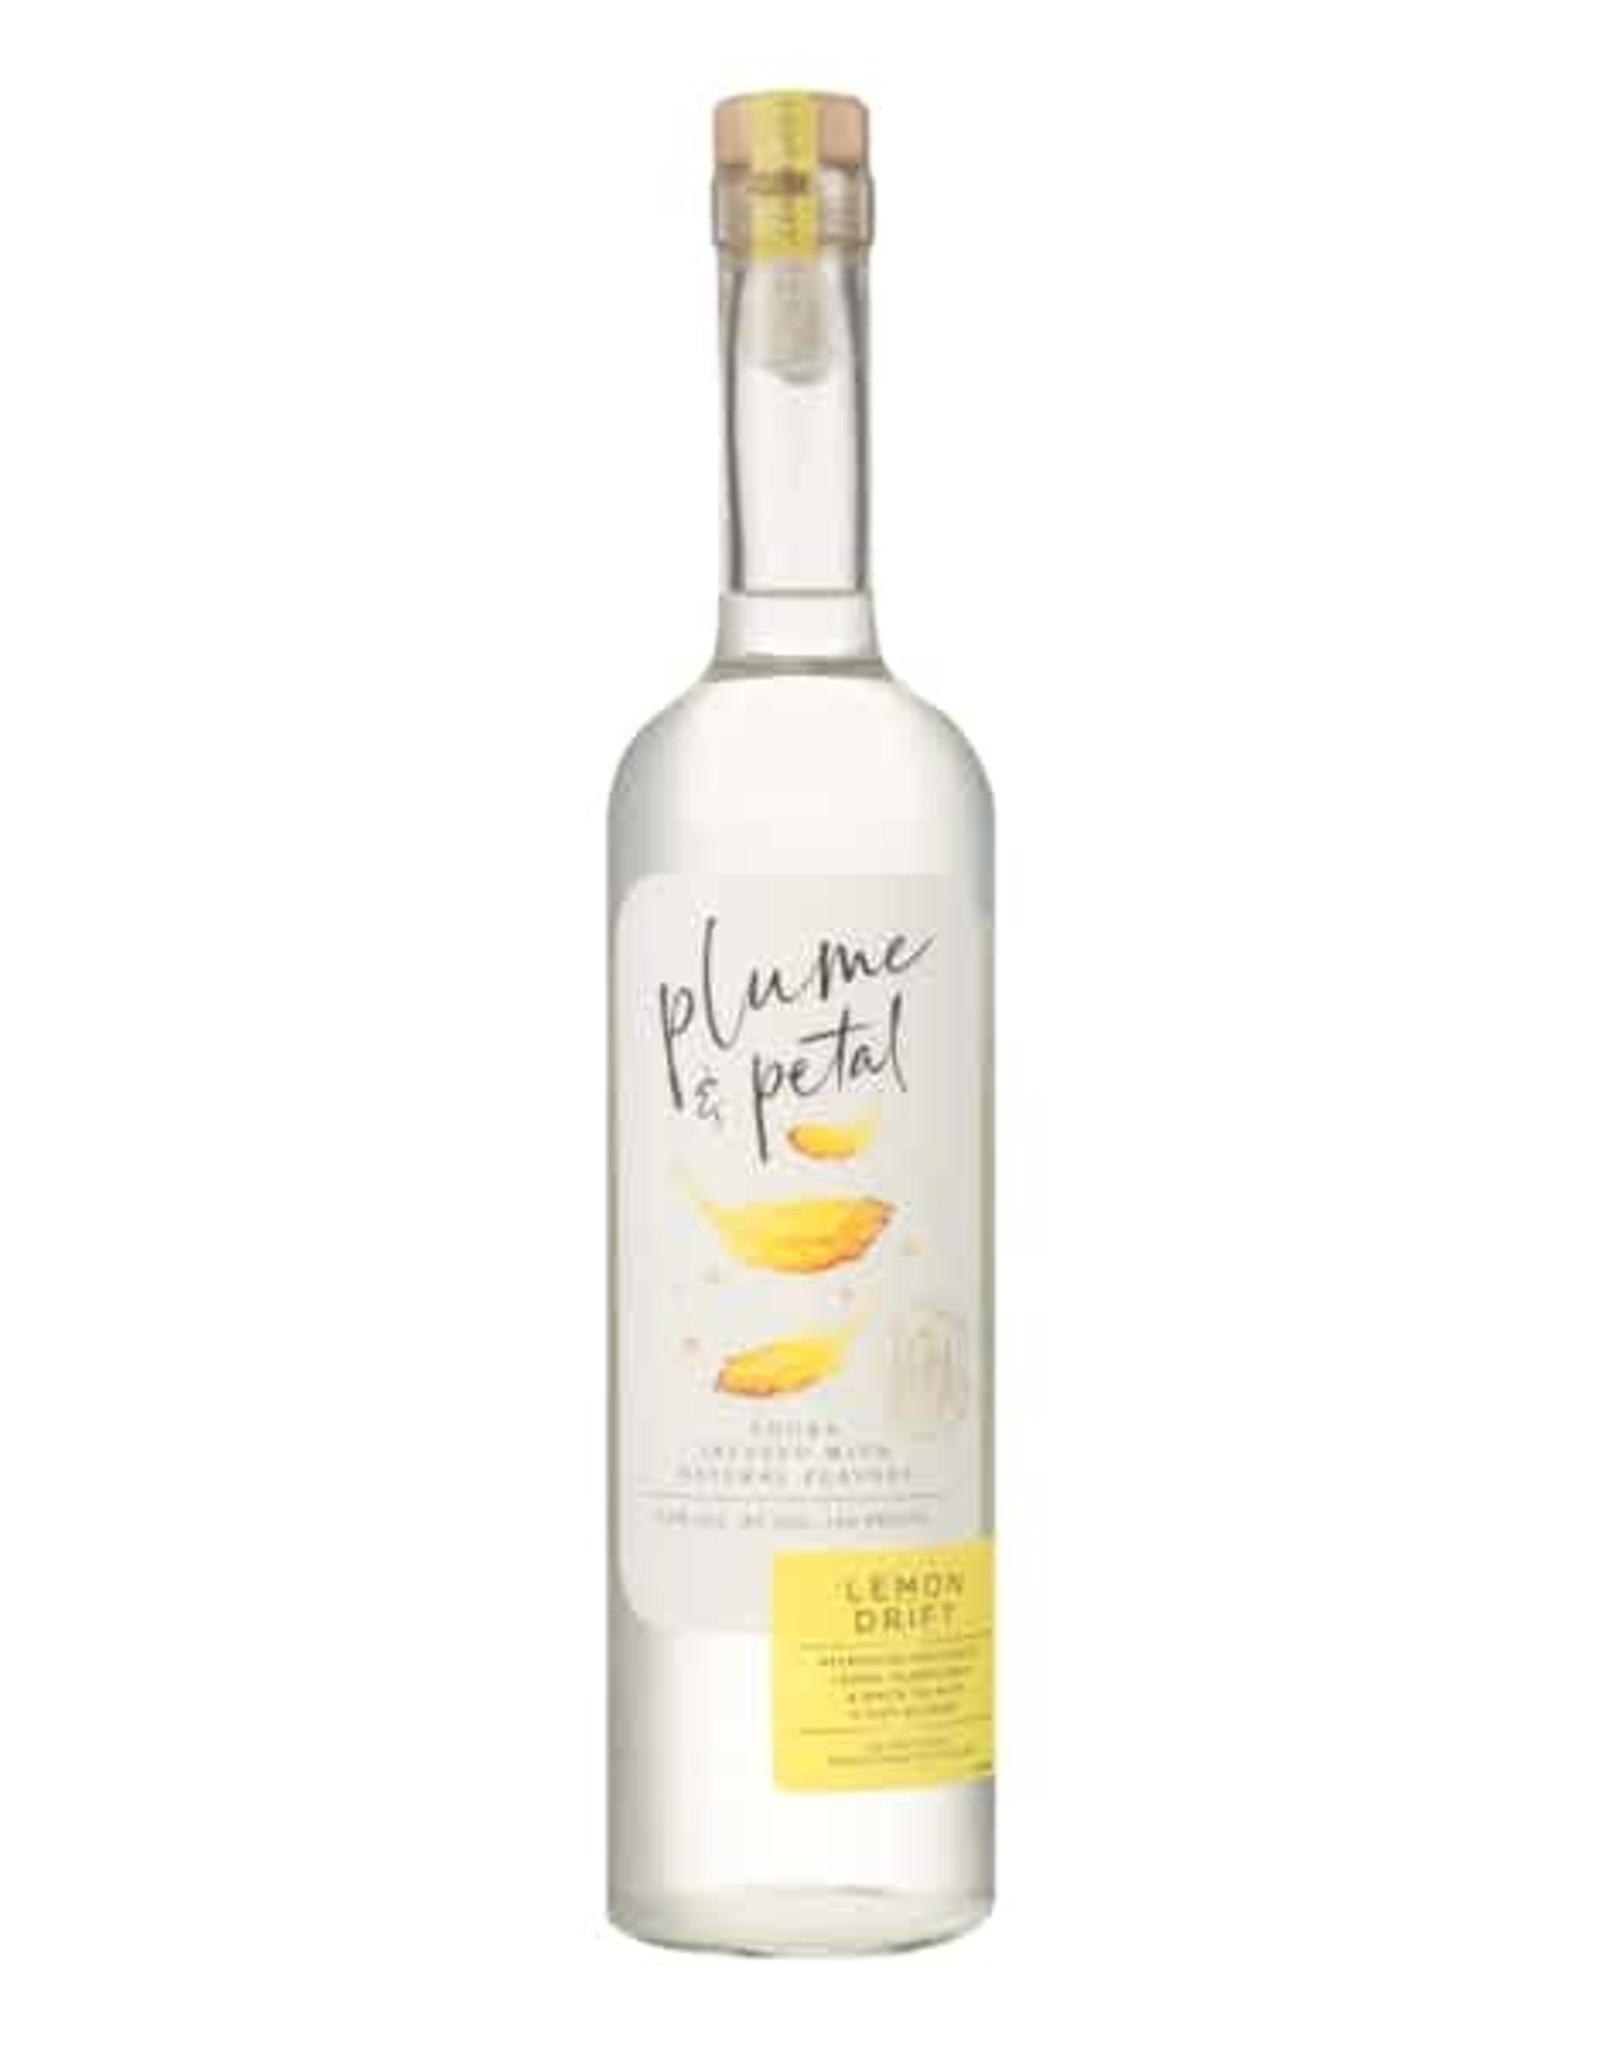 Plume & Petal Lemon